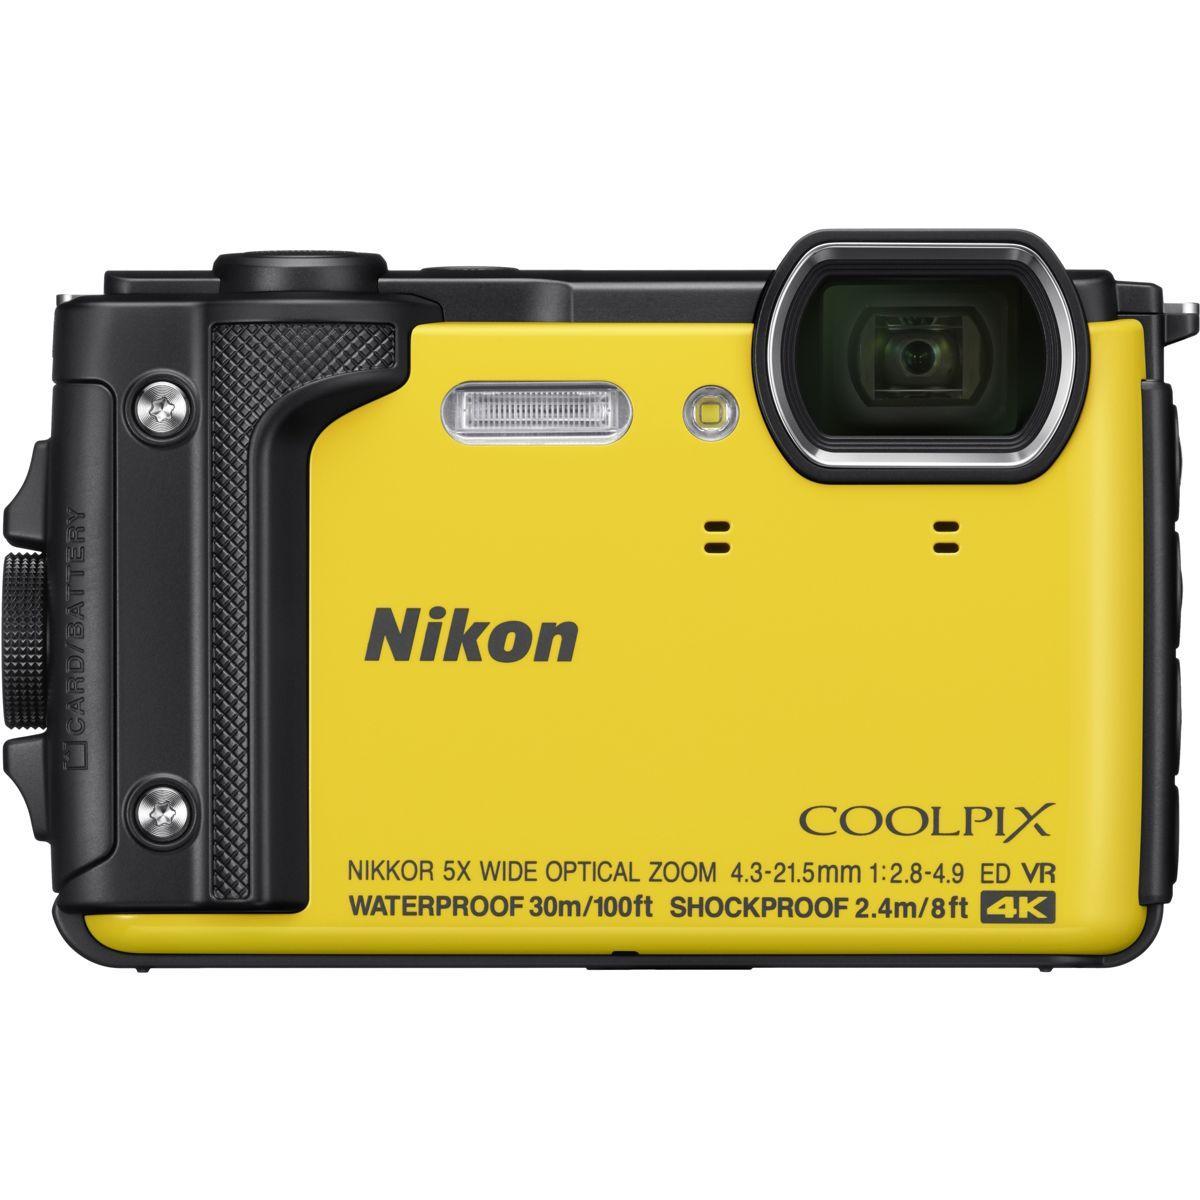 Appareil photo compact nikon coolpix w300 jaune (photo)